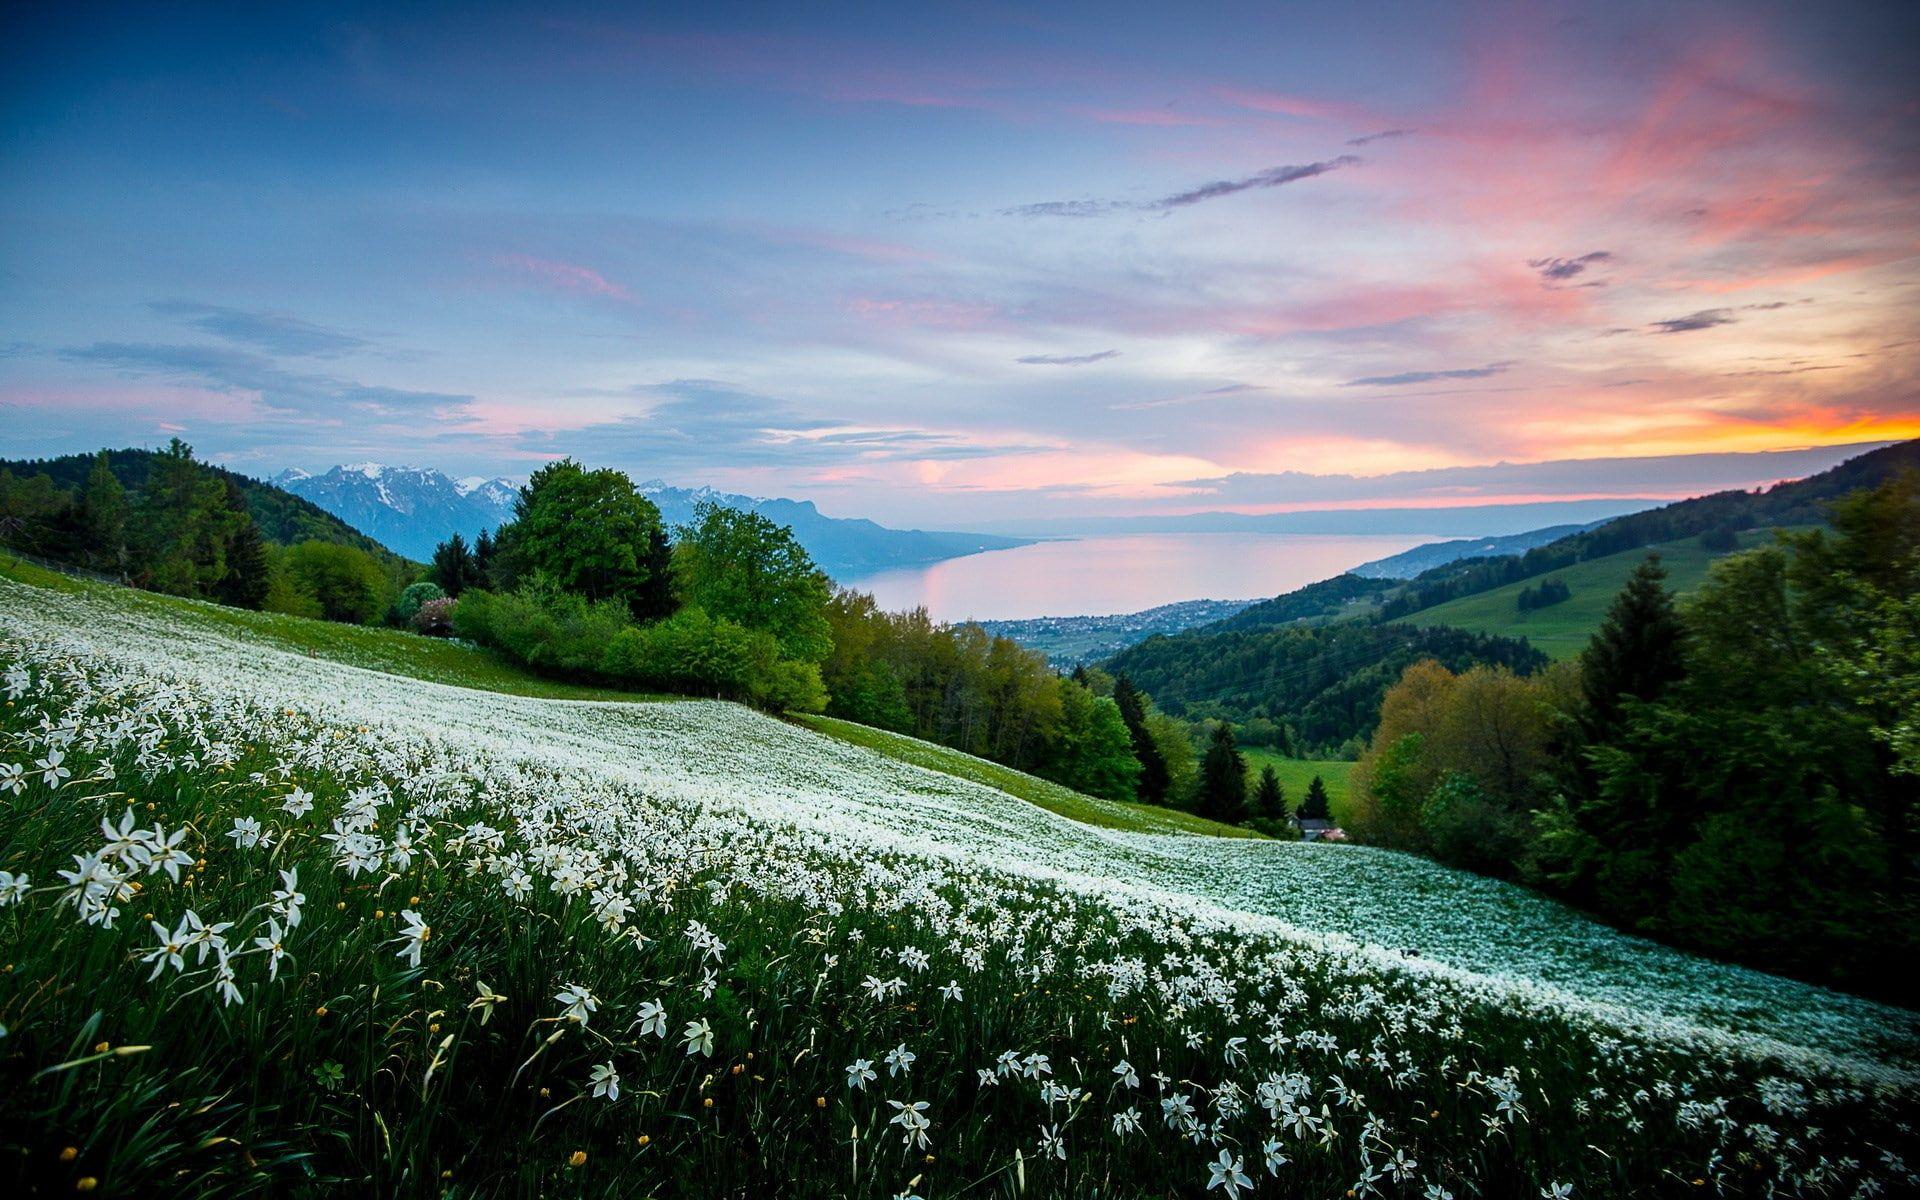 Beautiful Scenes Of Nature Hd Images 1920x1200 1080p Wallpaper Hdwallpaper Desktop Pejzazhi Zhivopisnye Pejzazhi Idei Ozeleneniya